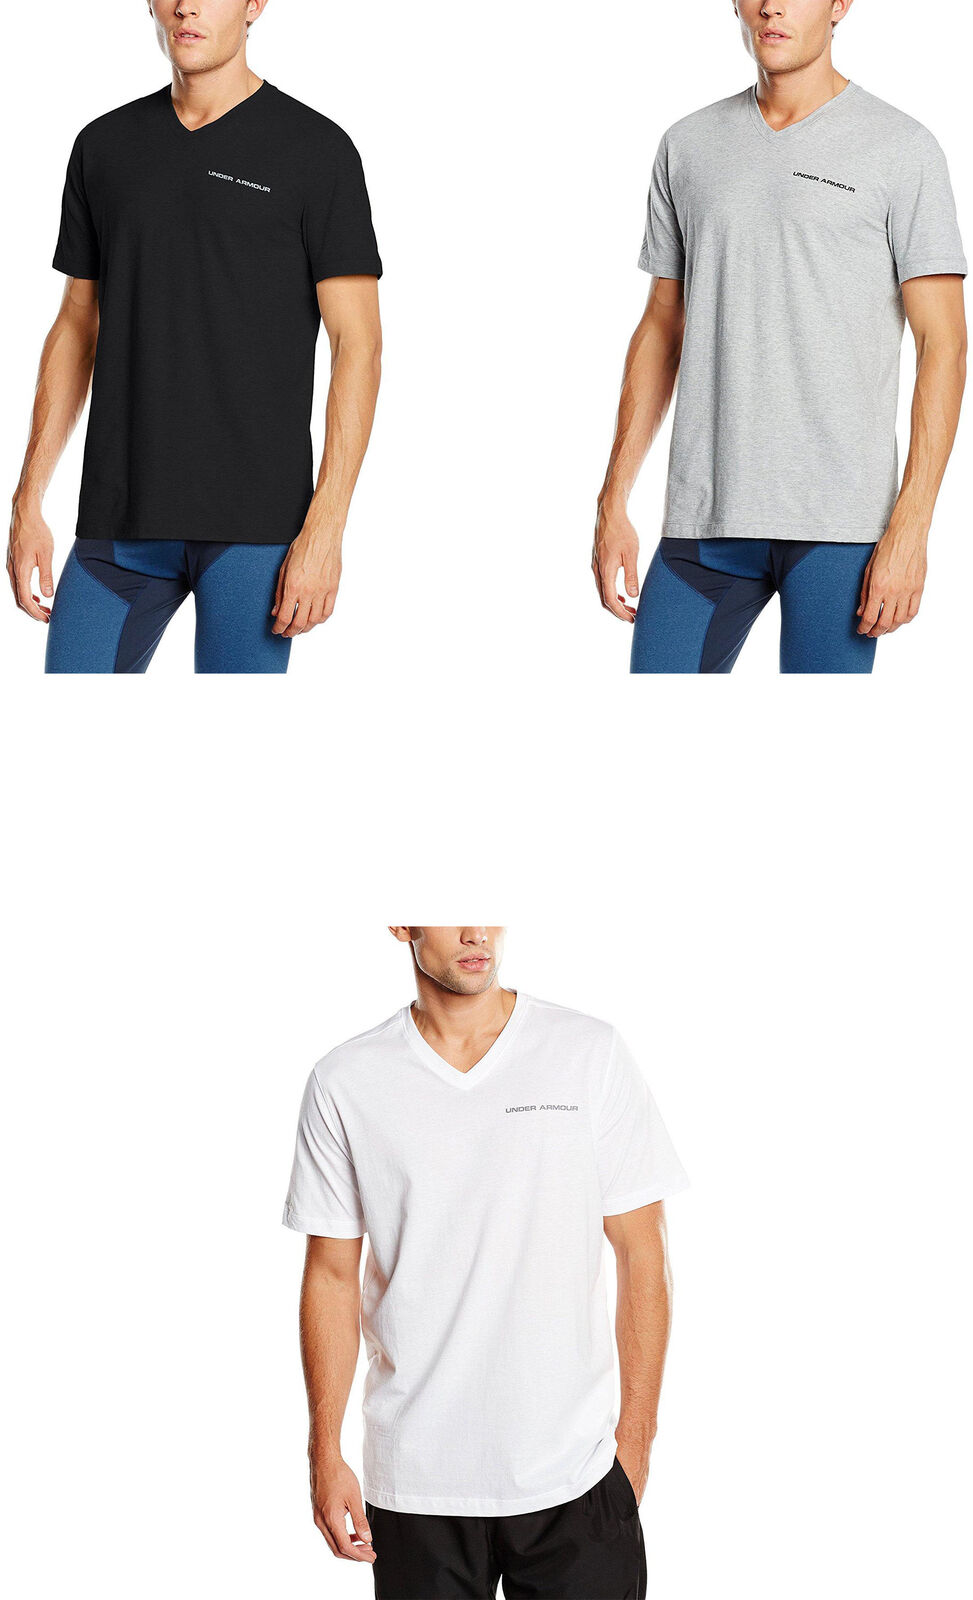 bbe9fafc Details about Under Armour Men's Charged Cotton V-Neck Shirt, 3 Colors